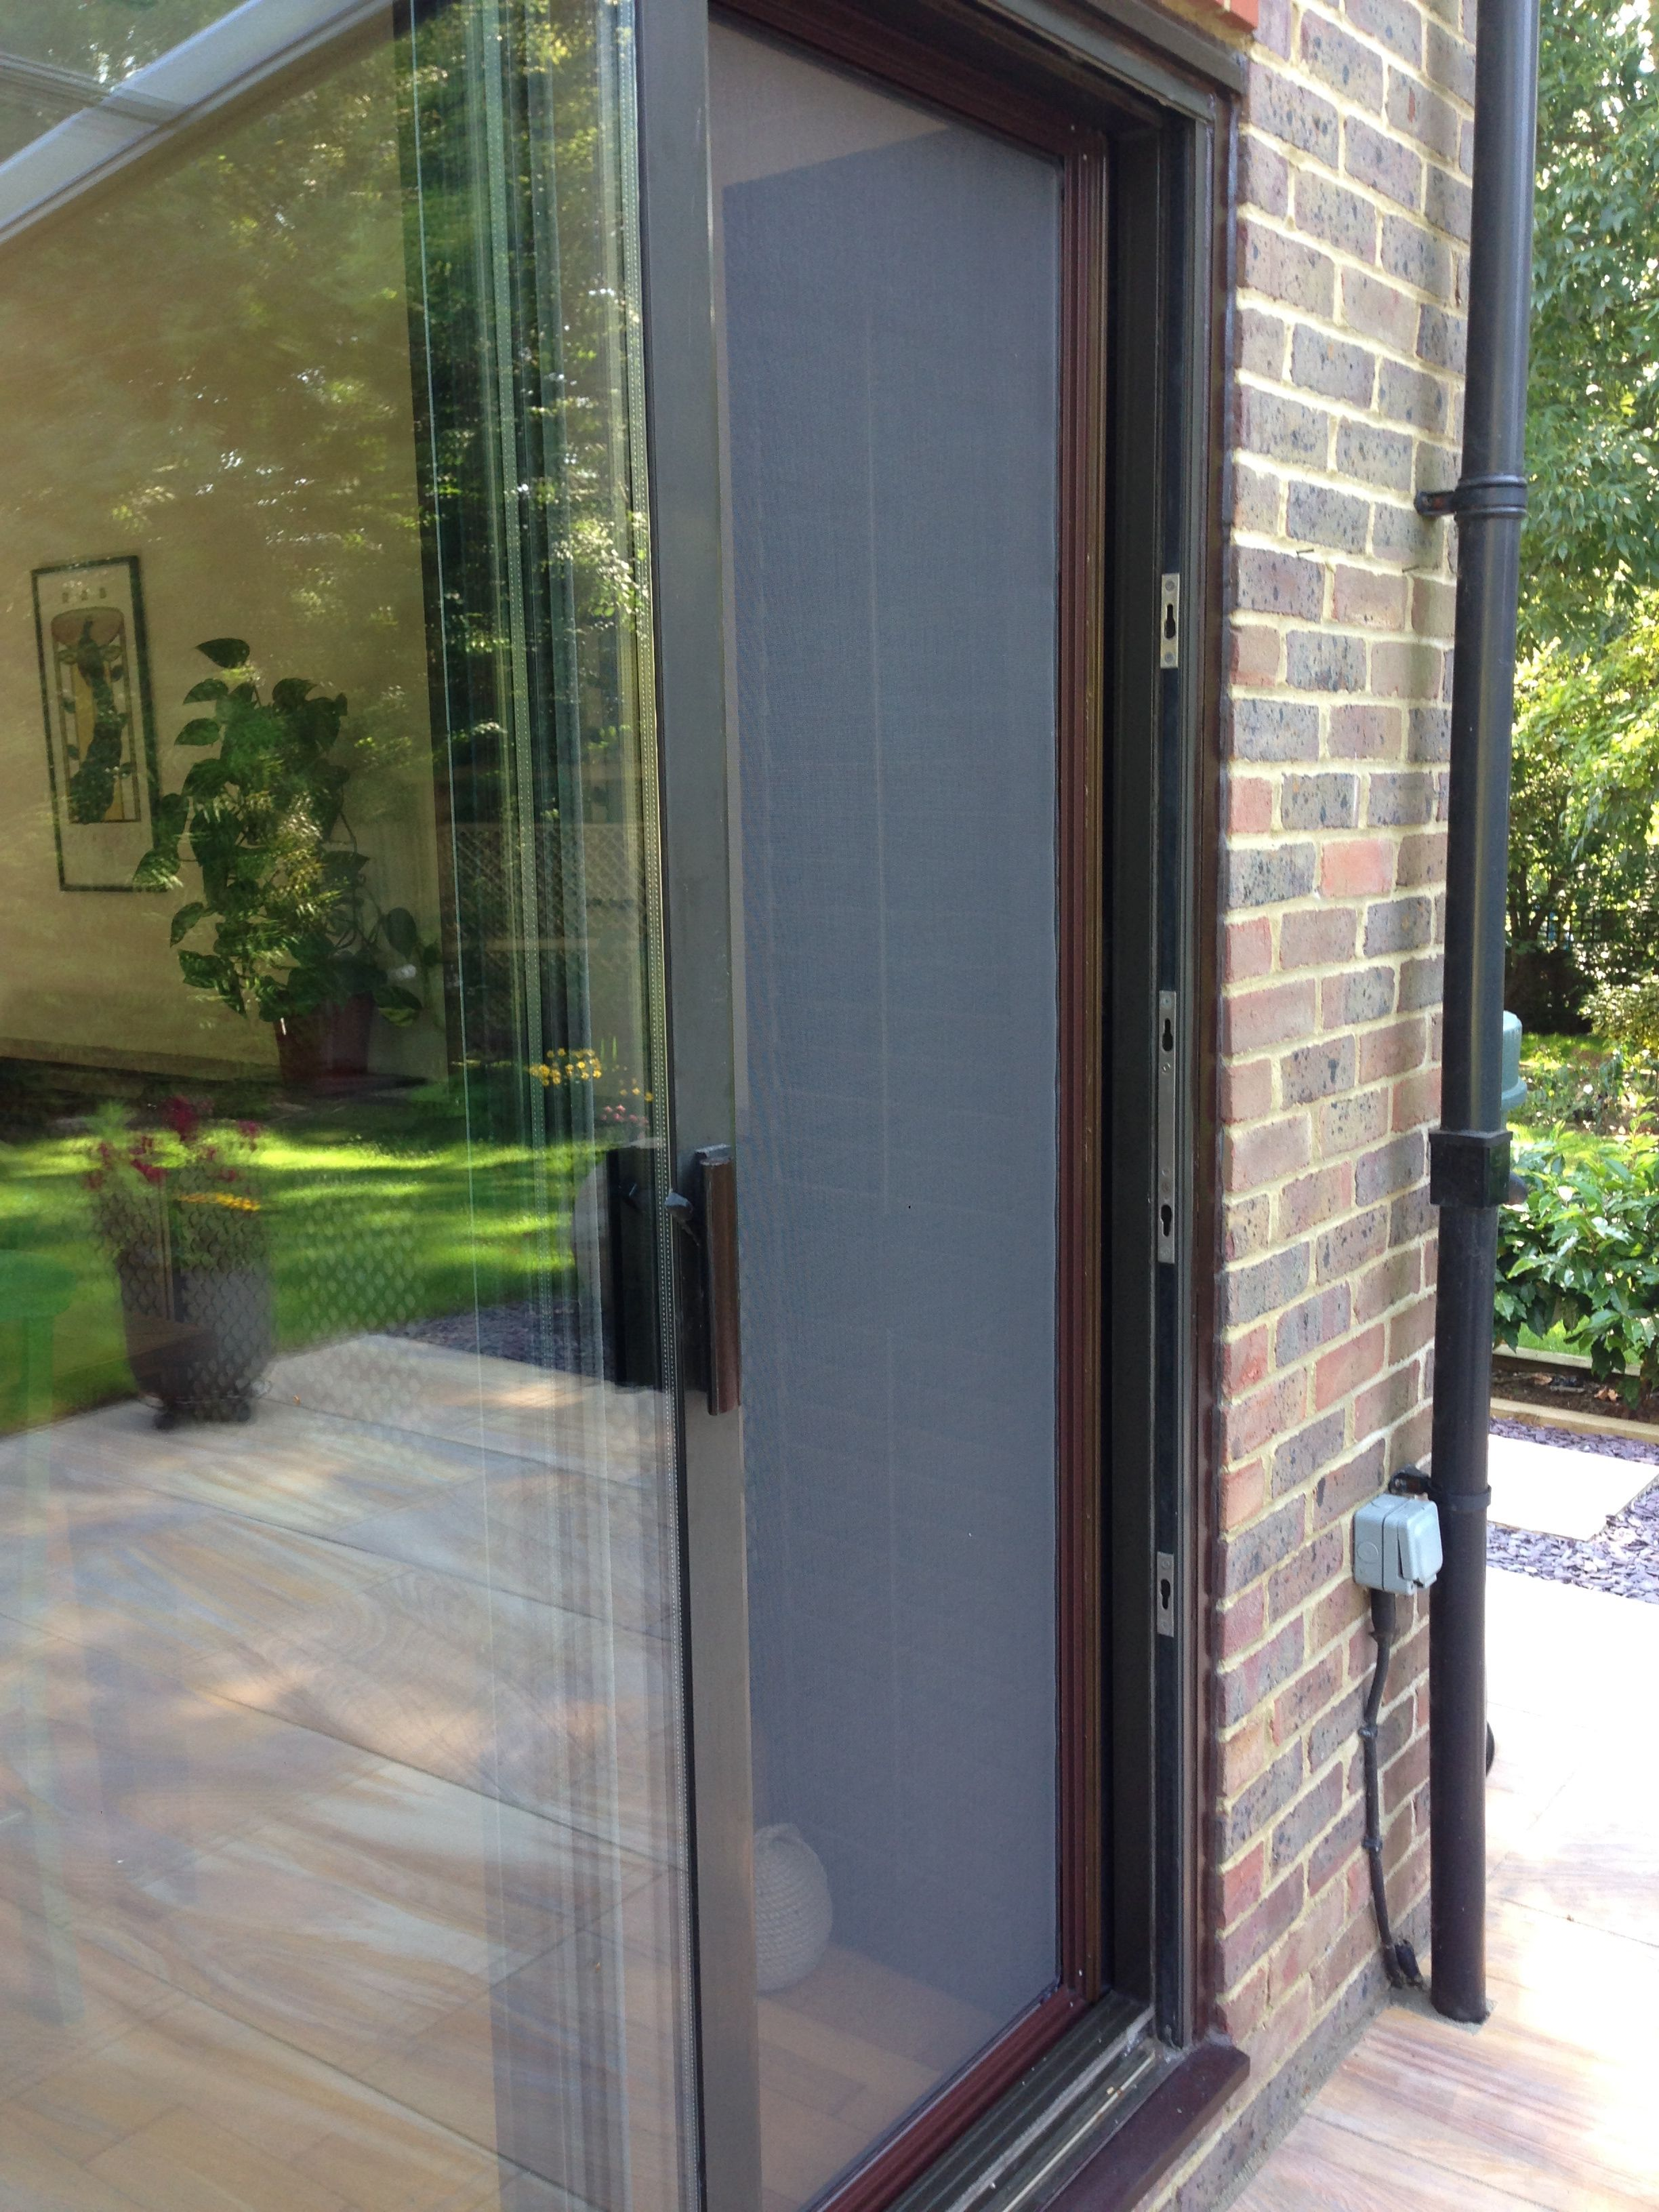 Corner Star Sliding Flyscreen Door Kent Decor Insect Screening Home Decor